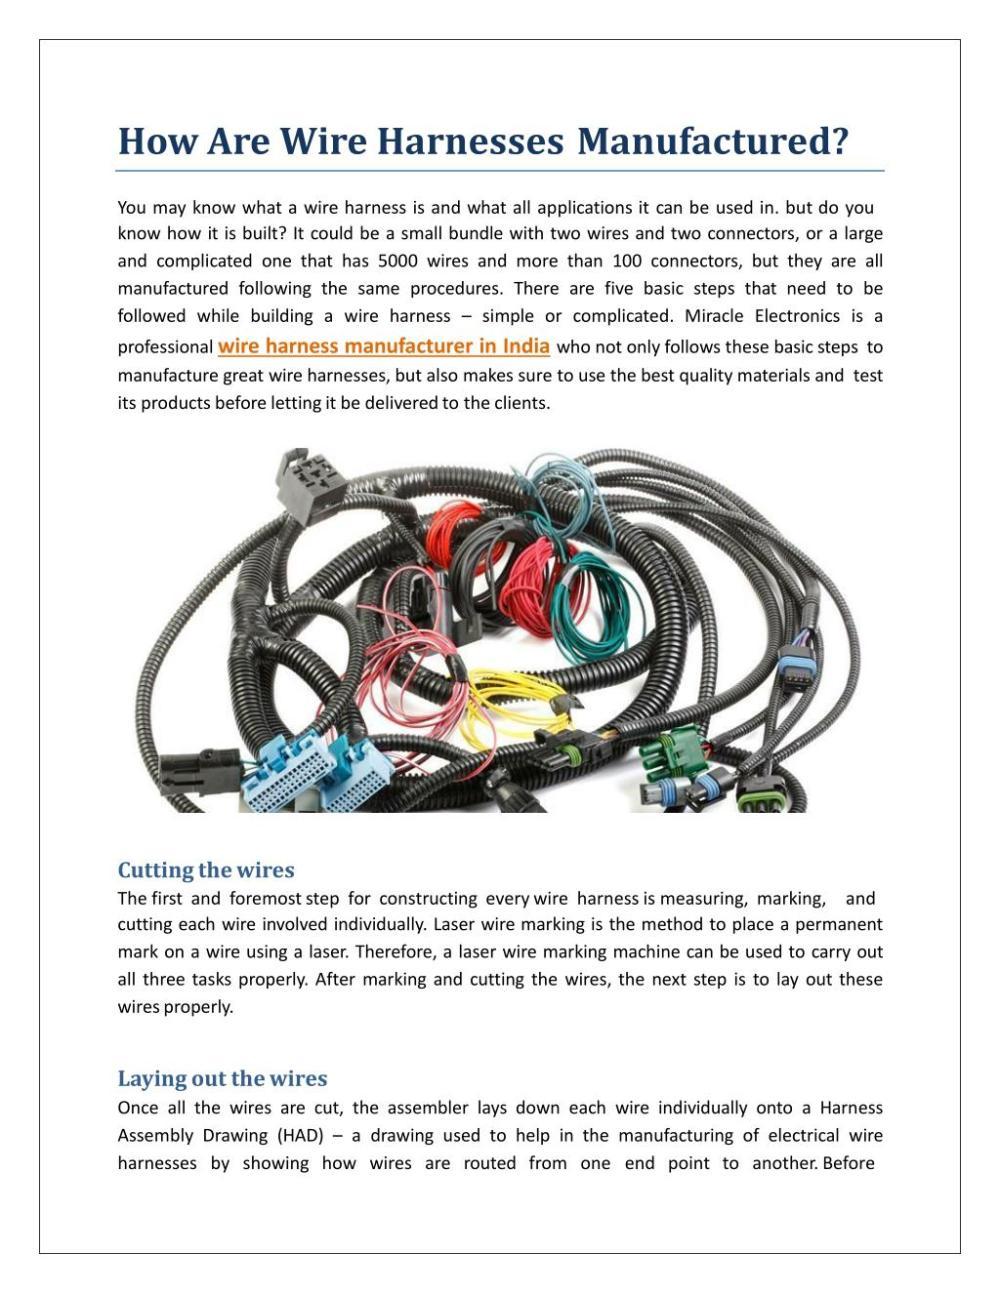 medium resolution of how are wire harnessesmanufactured youmayknowwhatawireharnessisandwhatallapplicationsitcanbeusedin butdoyou